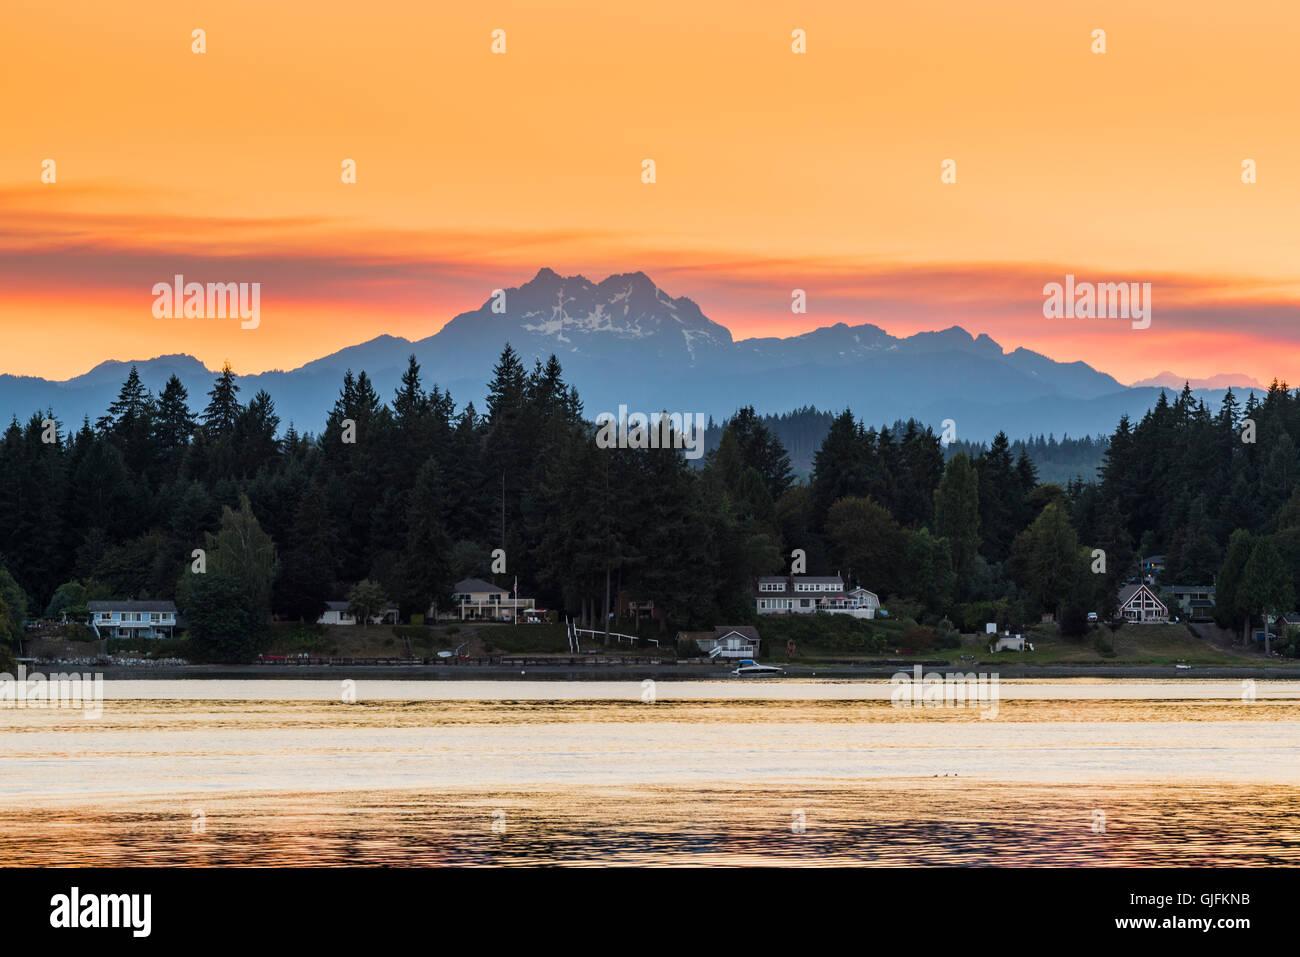 Picturesque sunset view over the Olympic Peninsula mountains, Bremerton, Kitsap Peninsula, Washington, USA - Stock Image